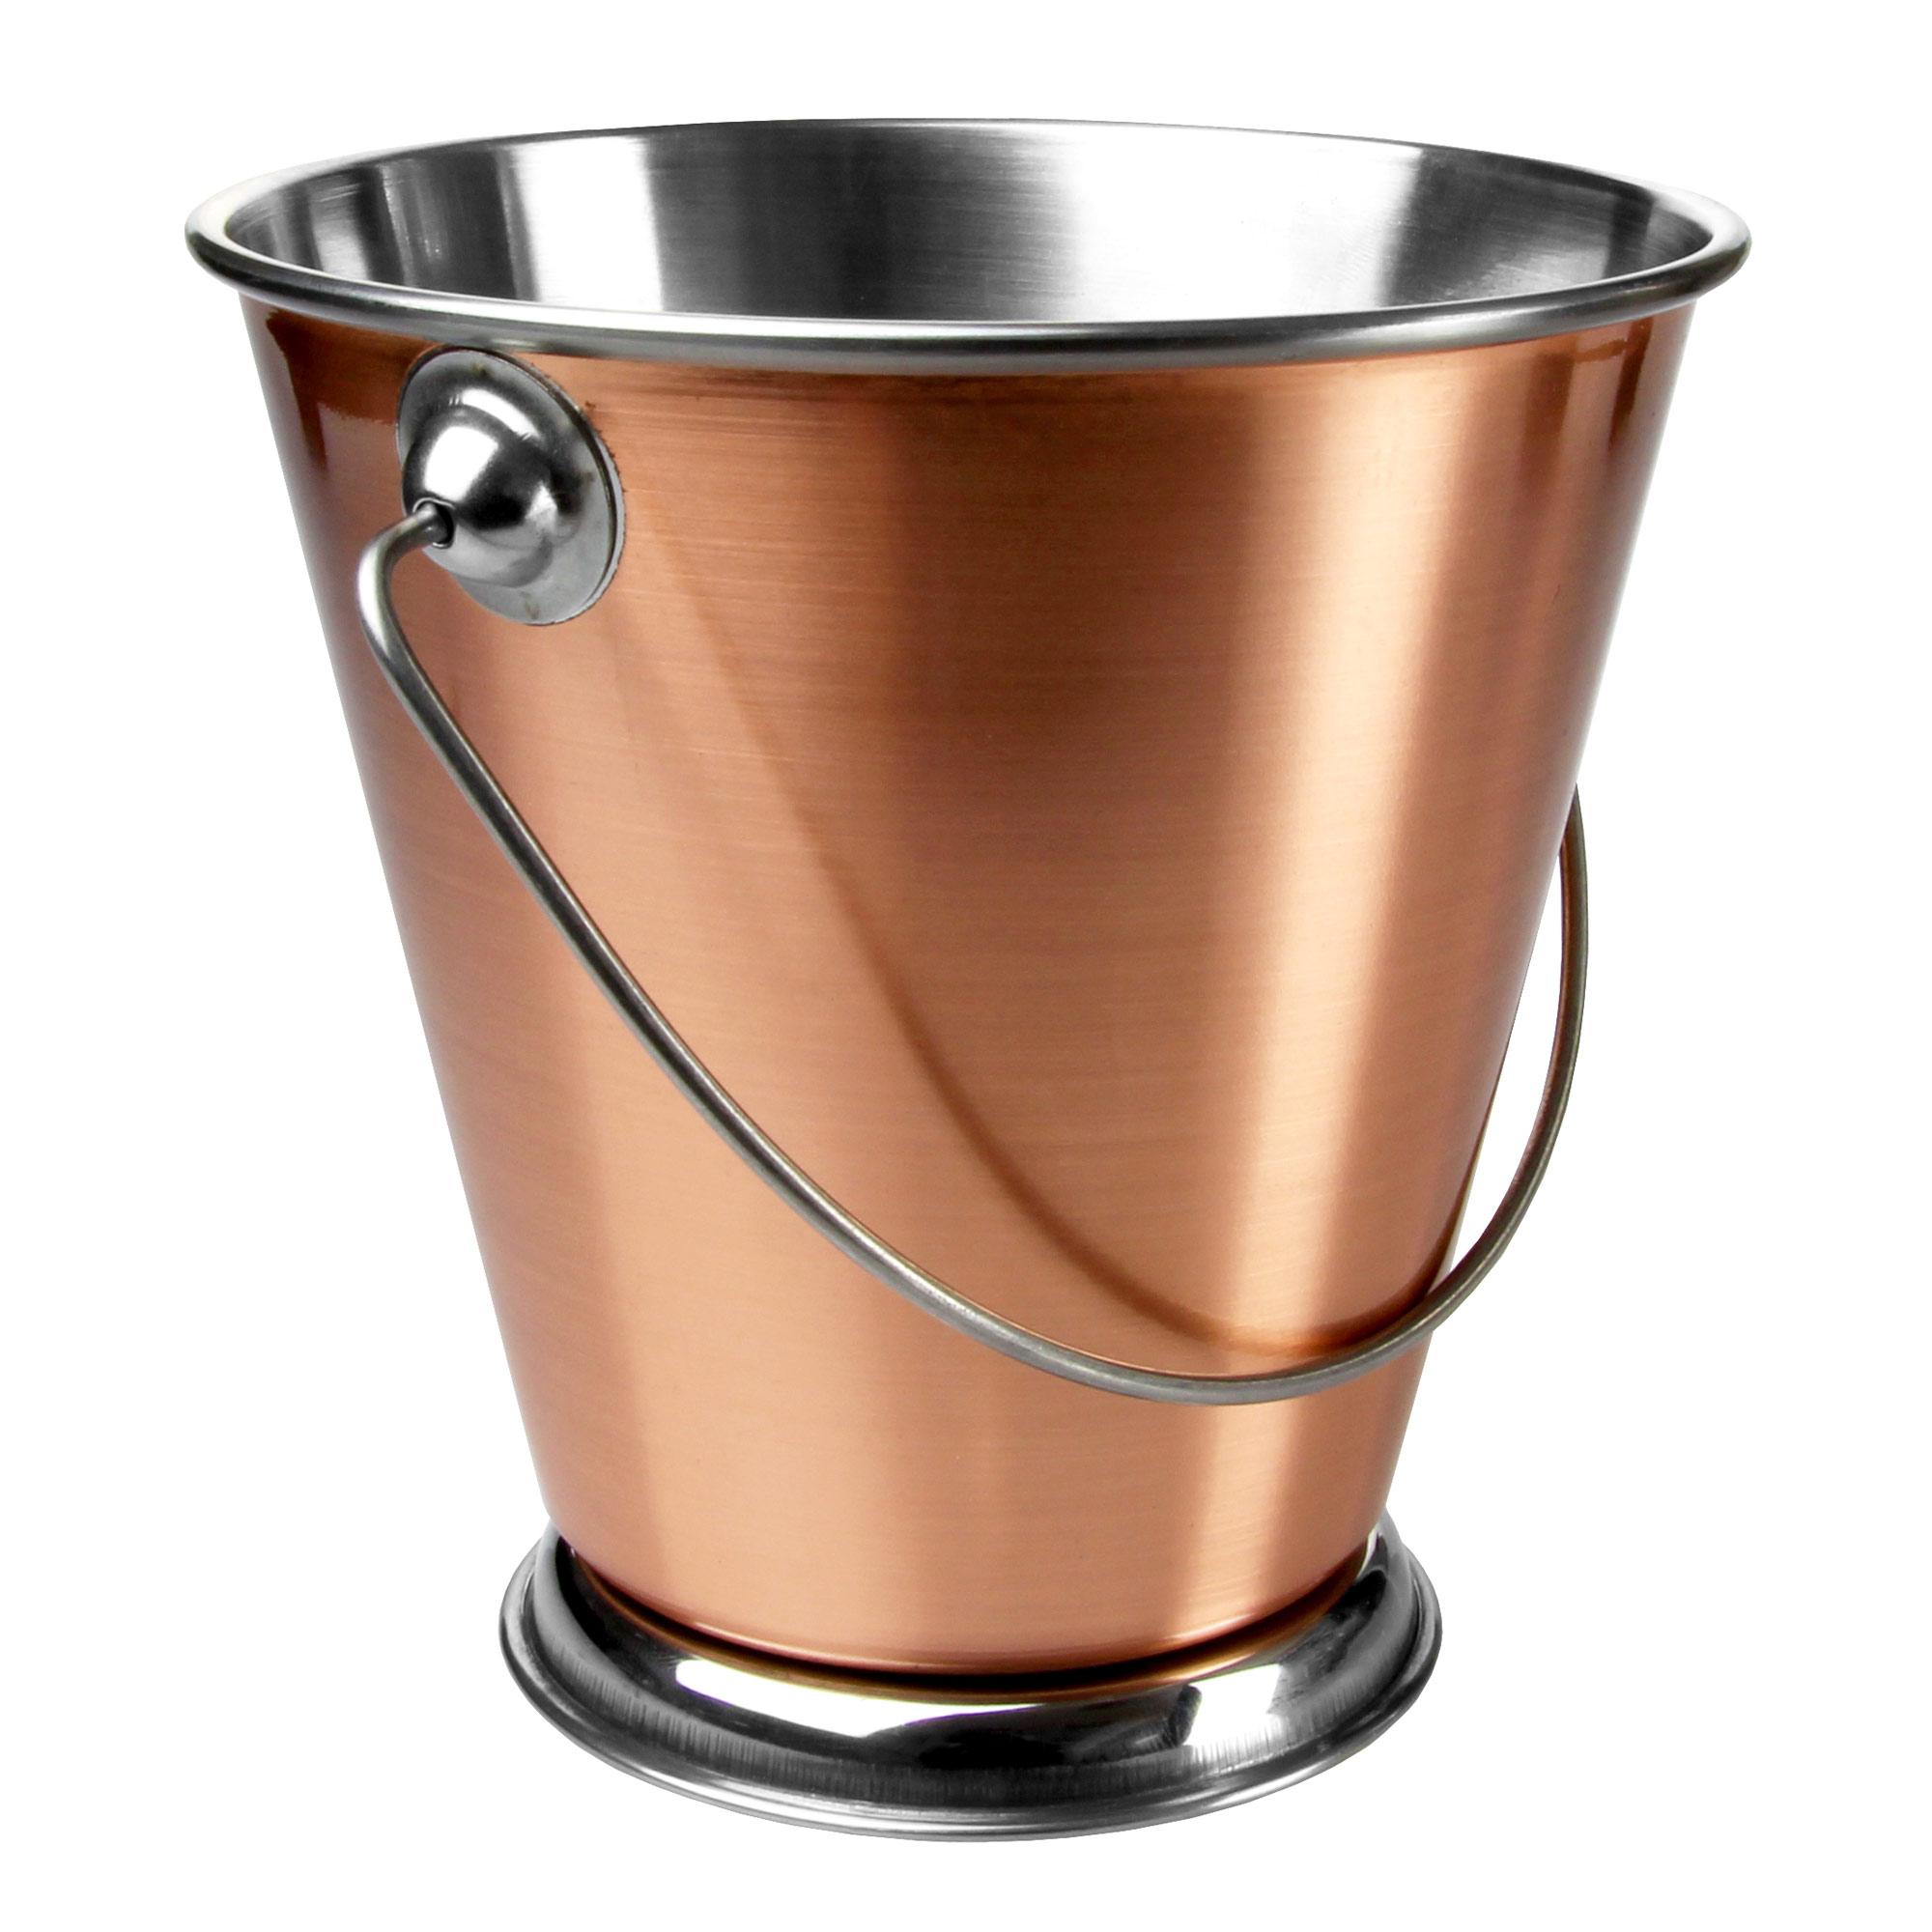 Mini Copper Pail Food Presentation Bucket With Handle 12cm